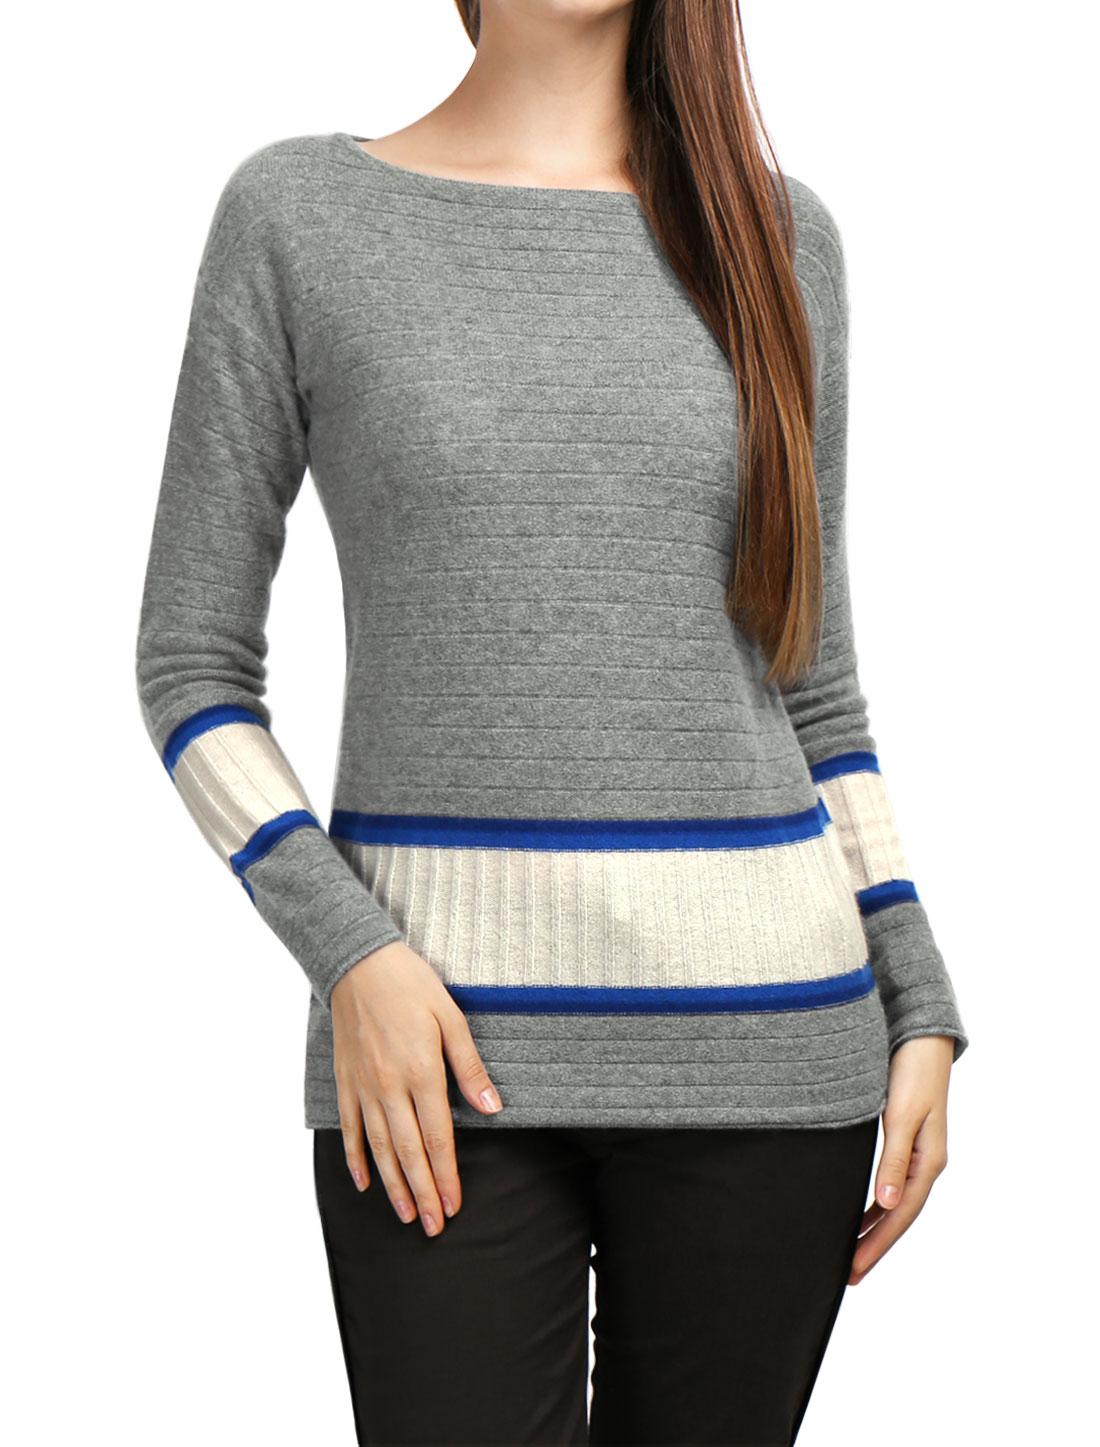 Women Boat Neck Jersey Contrast Rib Knit Cashmere Sweater Blue M